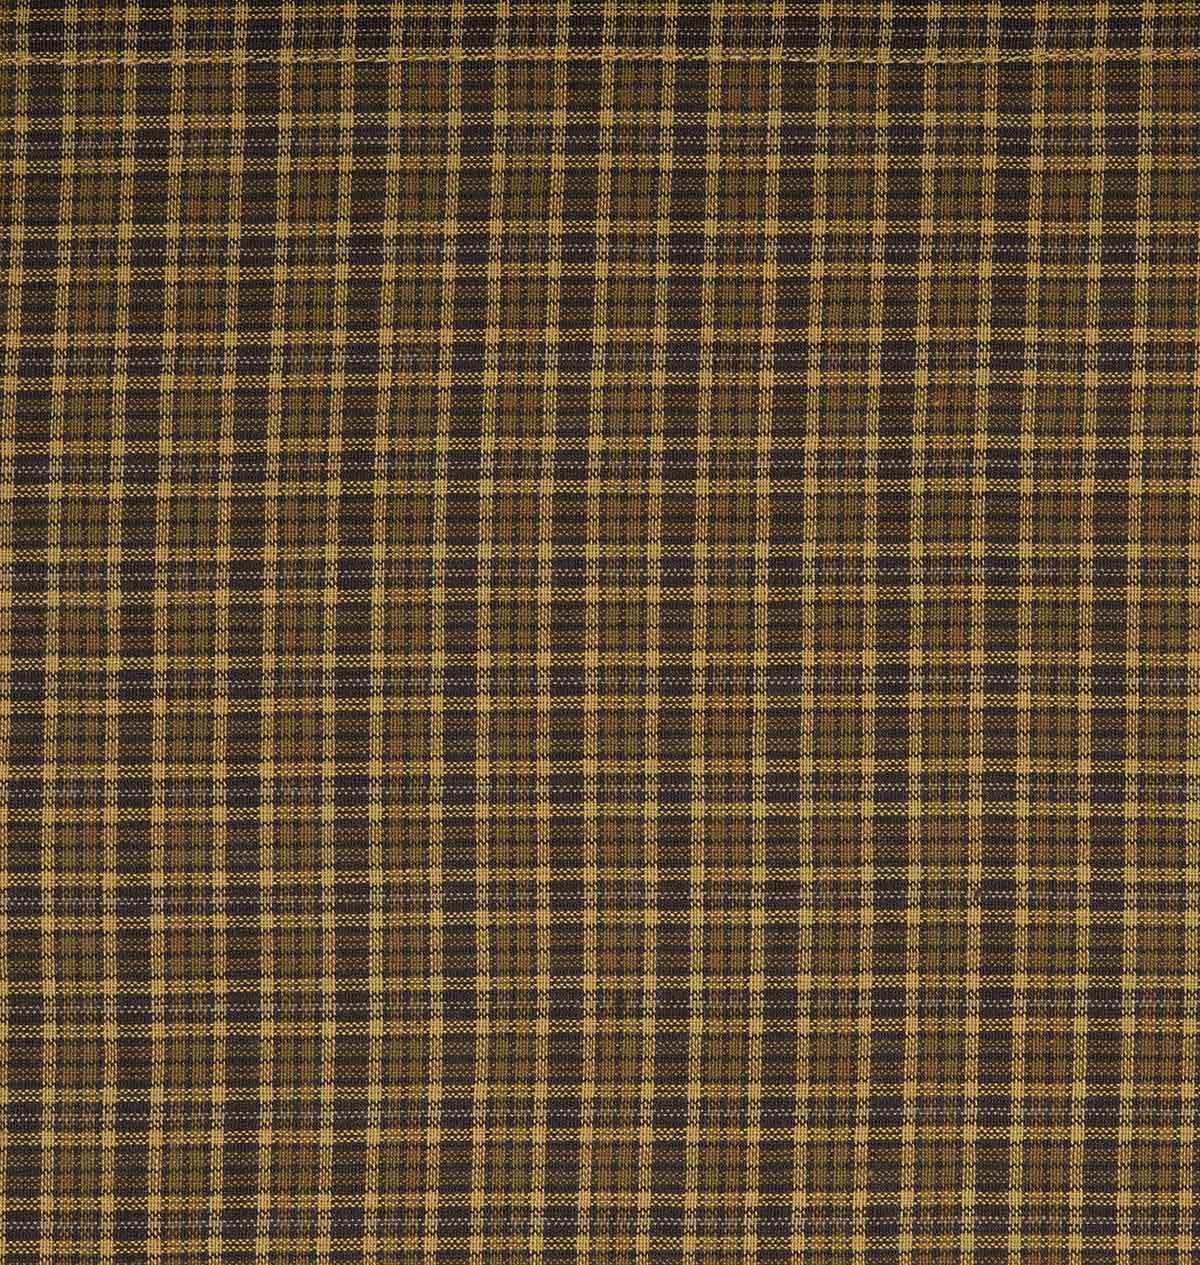 Tea Cabin Fabric Detail